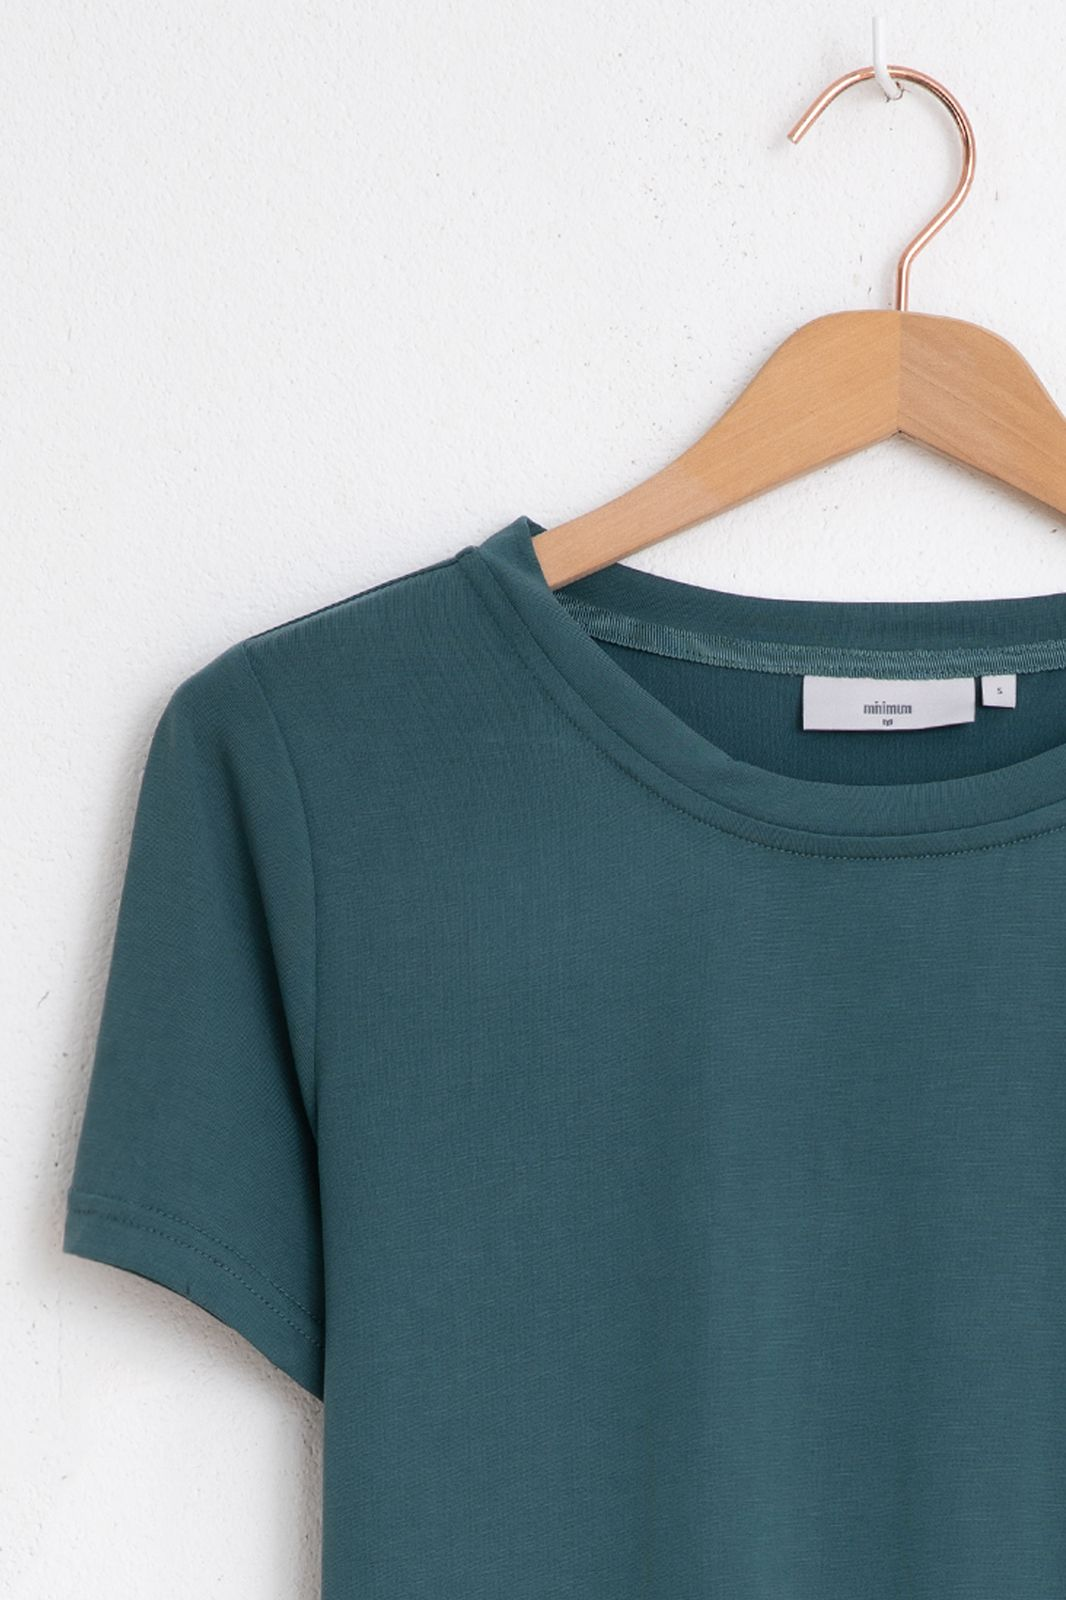 Minimum t-shirt Rynah 0281 groen